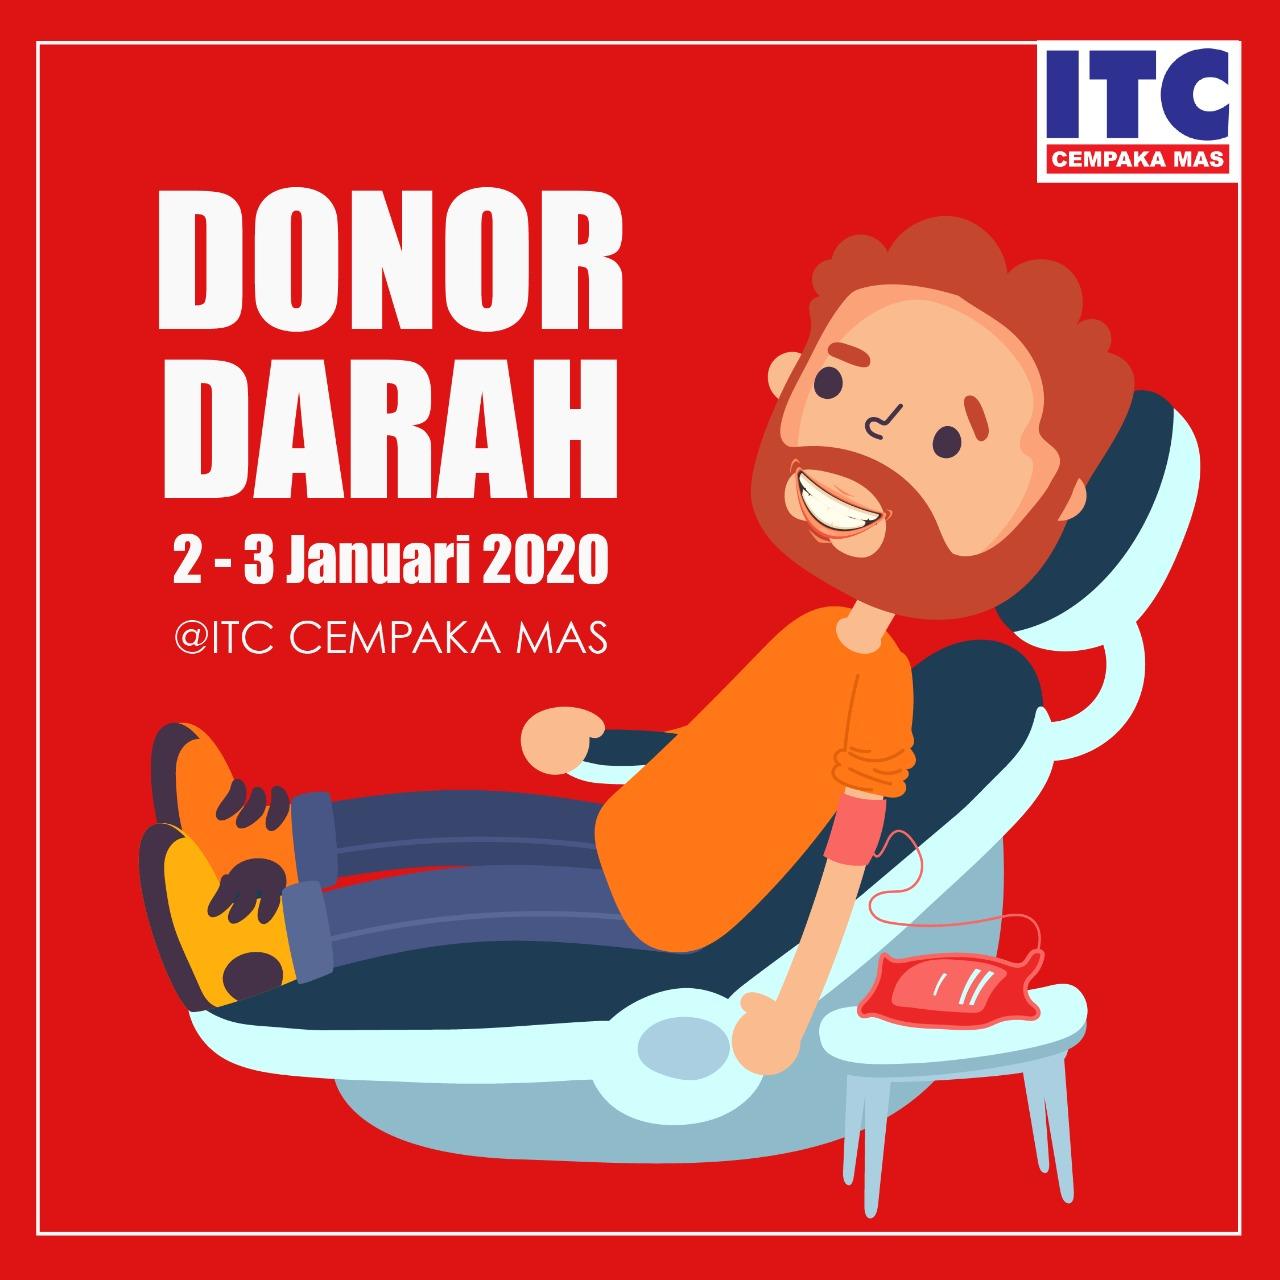 Event Donor Darah Jakarta ITC Cempaka Mas